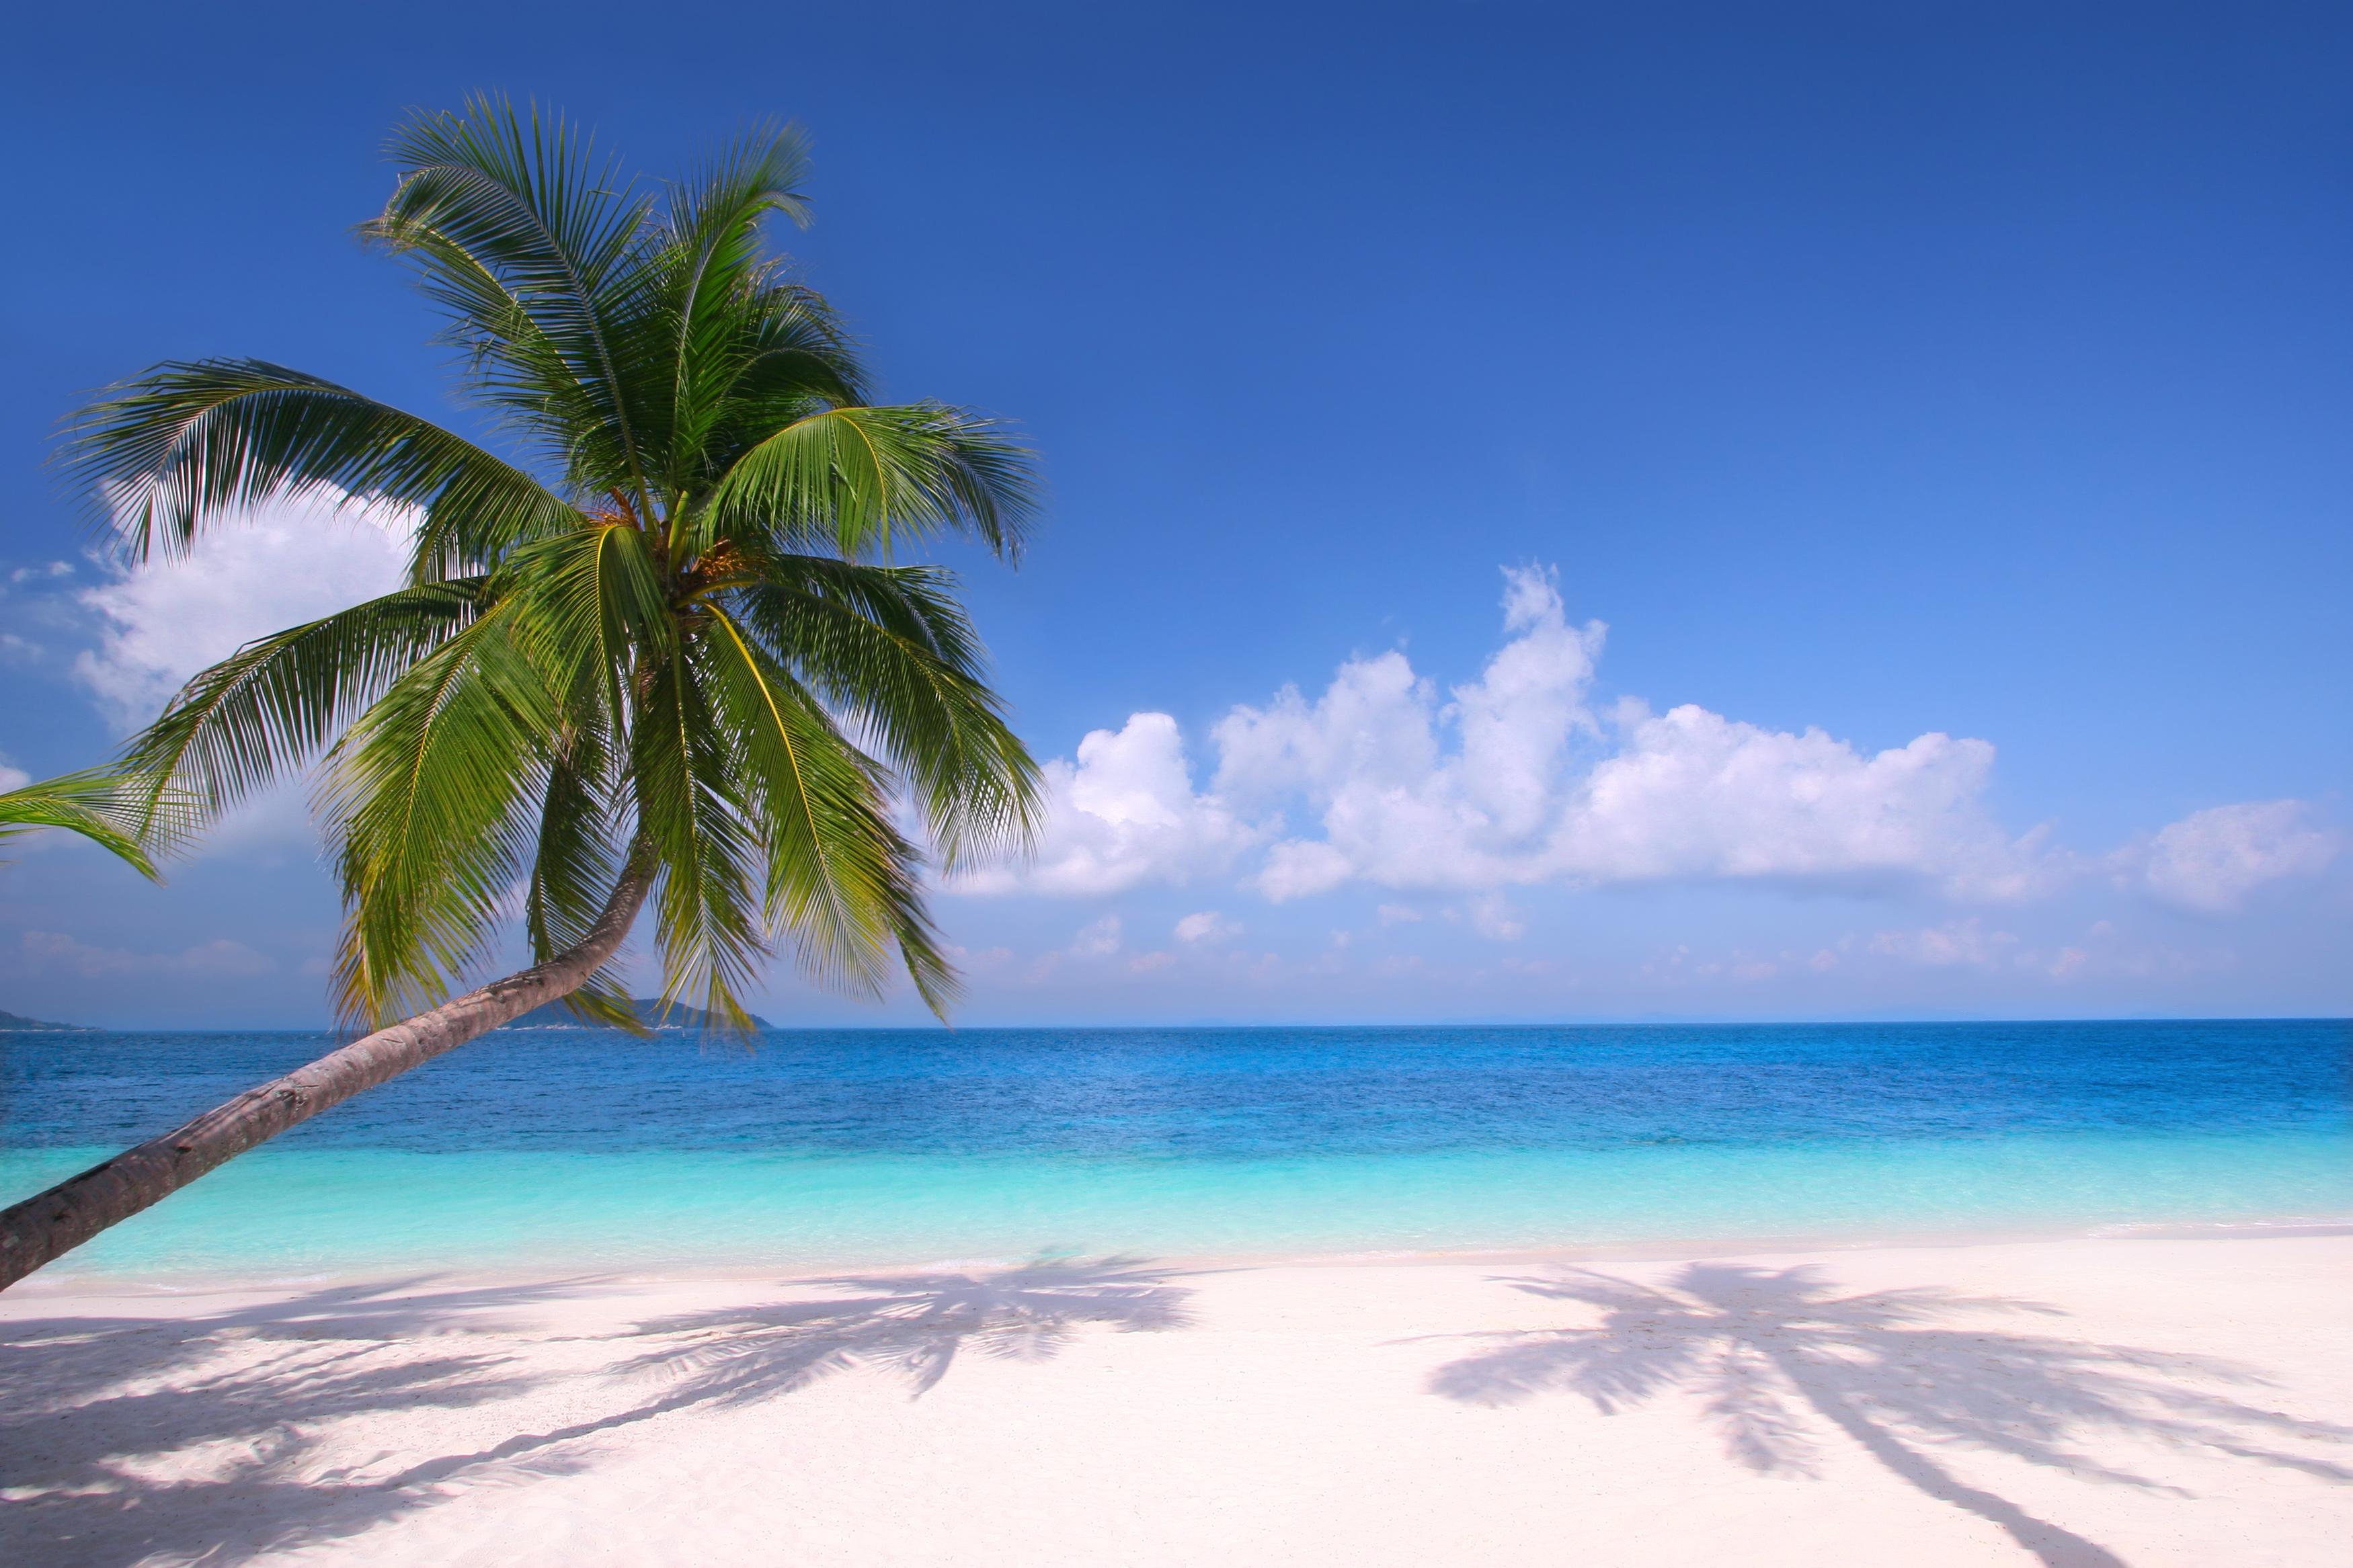 Sea clipart beach background #13